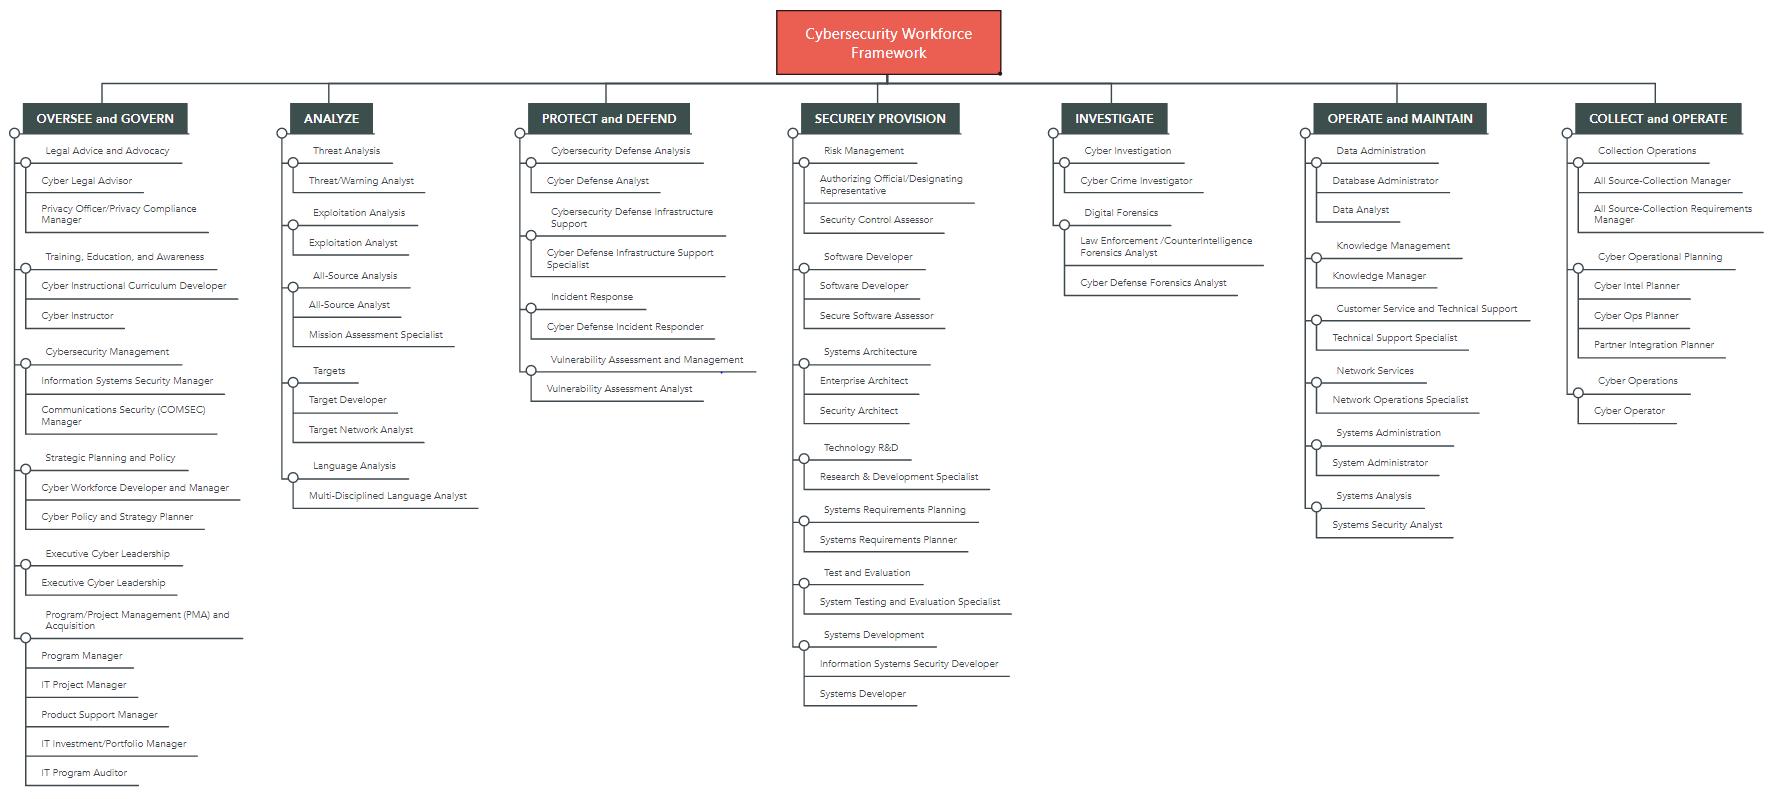 Mindmap Cybersecurity Workforce Framework